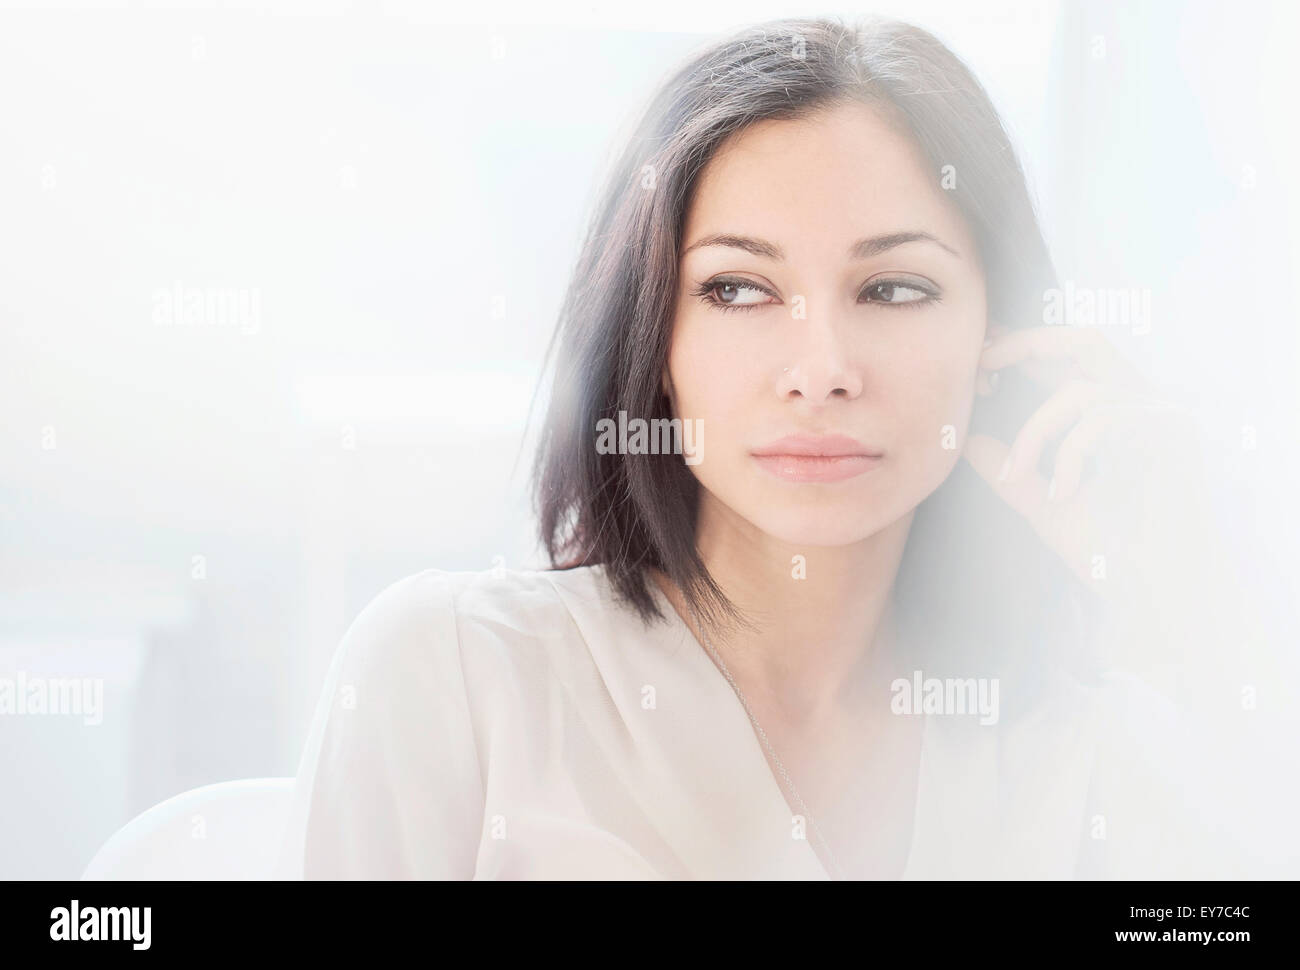 Retrato de mujer morena Imagen De Stock